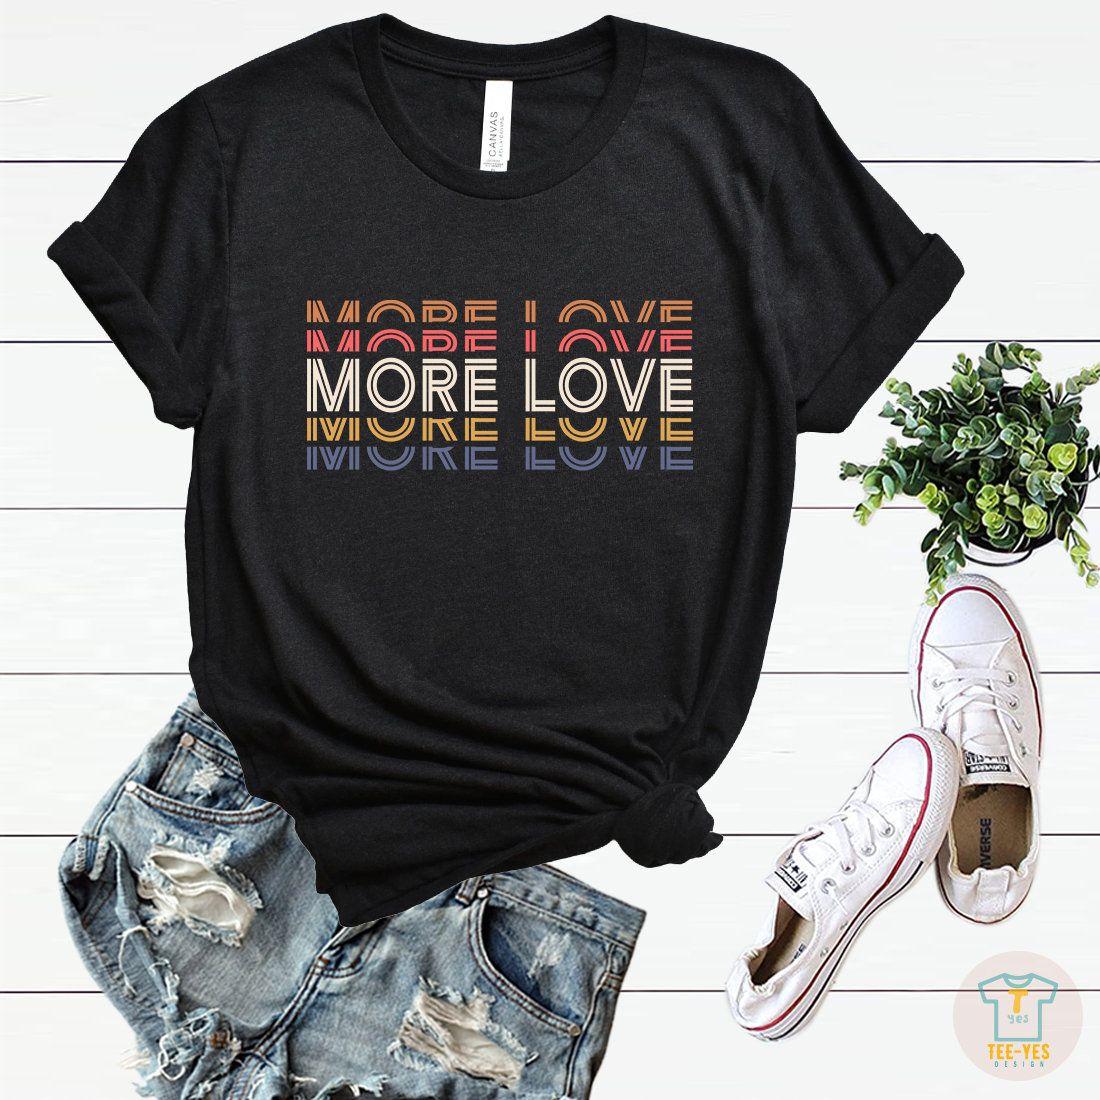 Choose Happy T-Shirt Unisex Short Sleeve T Shirt Graphic T-Shirt Men/'s Tee Choose Happy Women/'s Tee Soft Cotton Tee